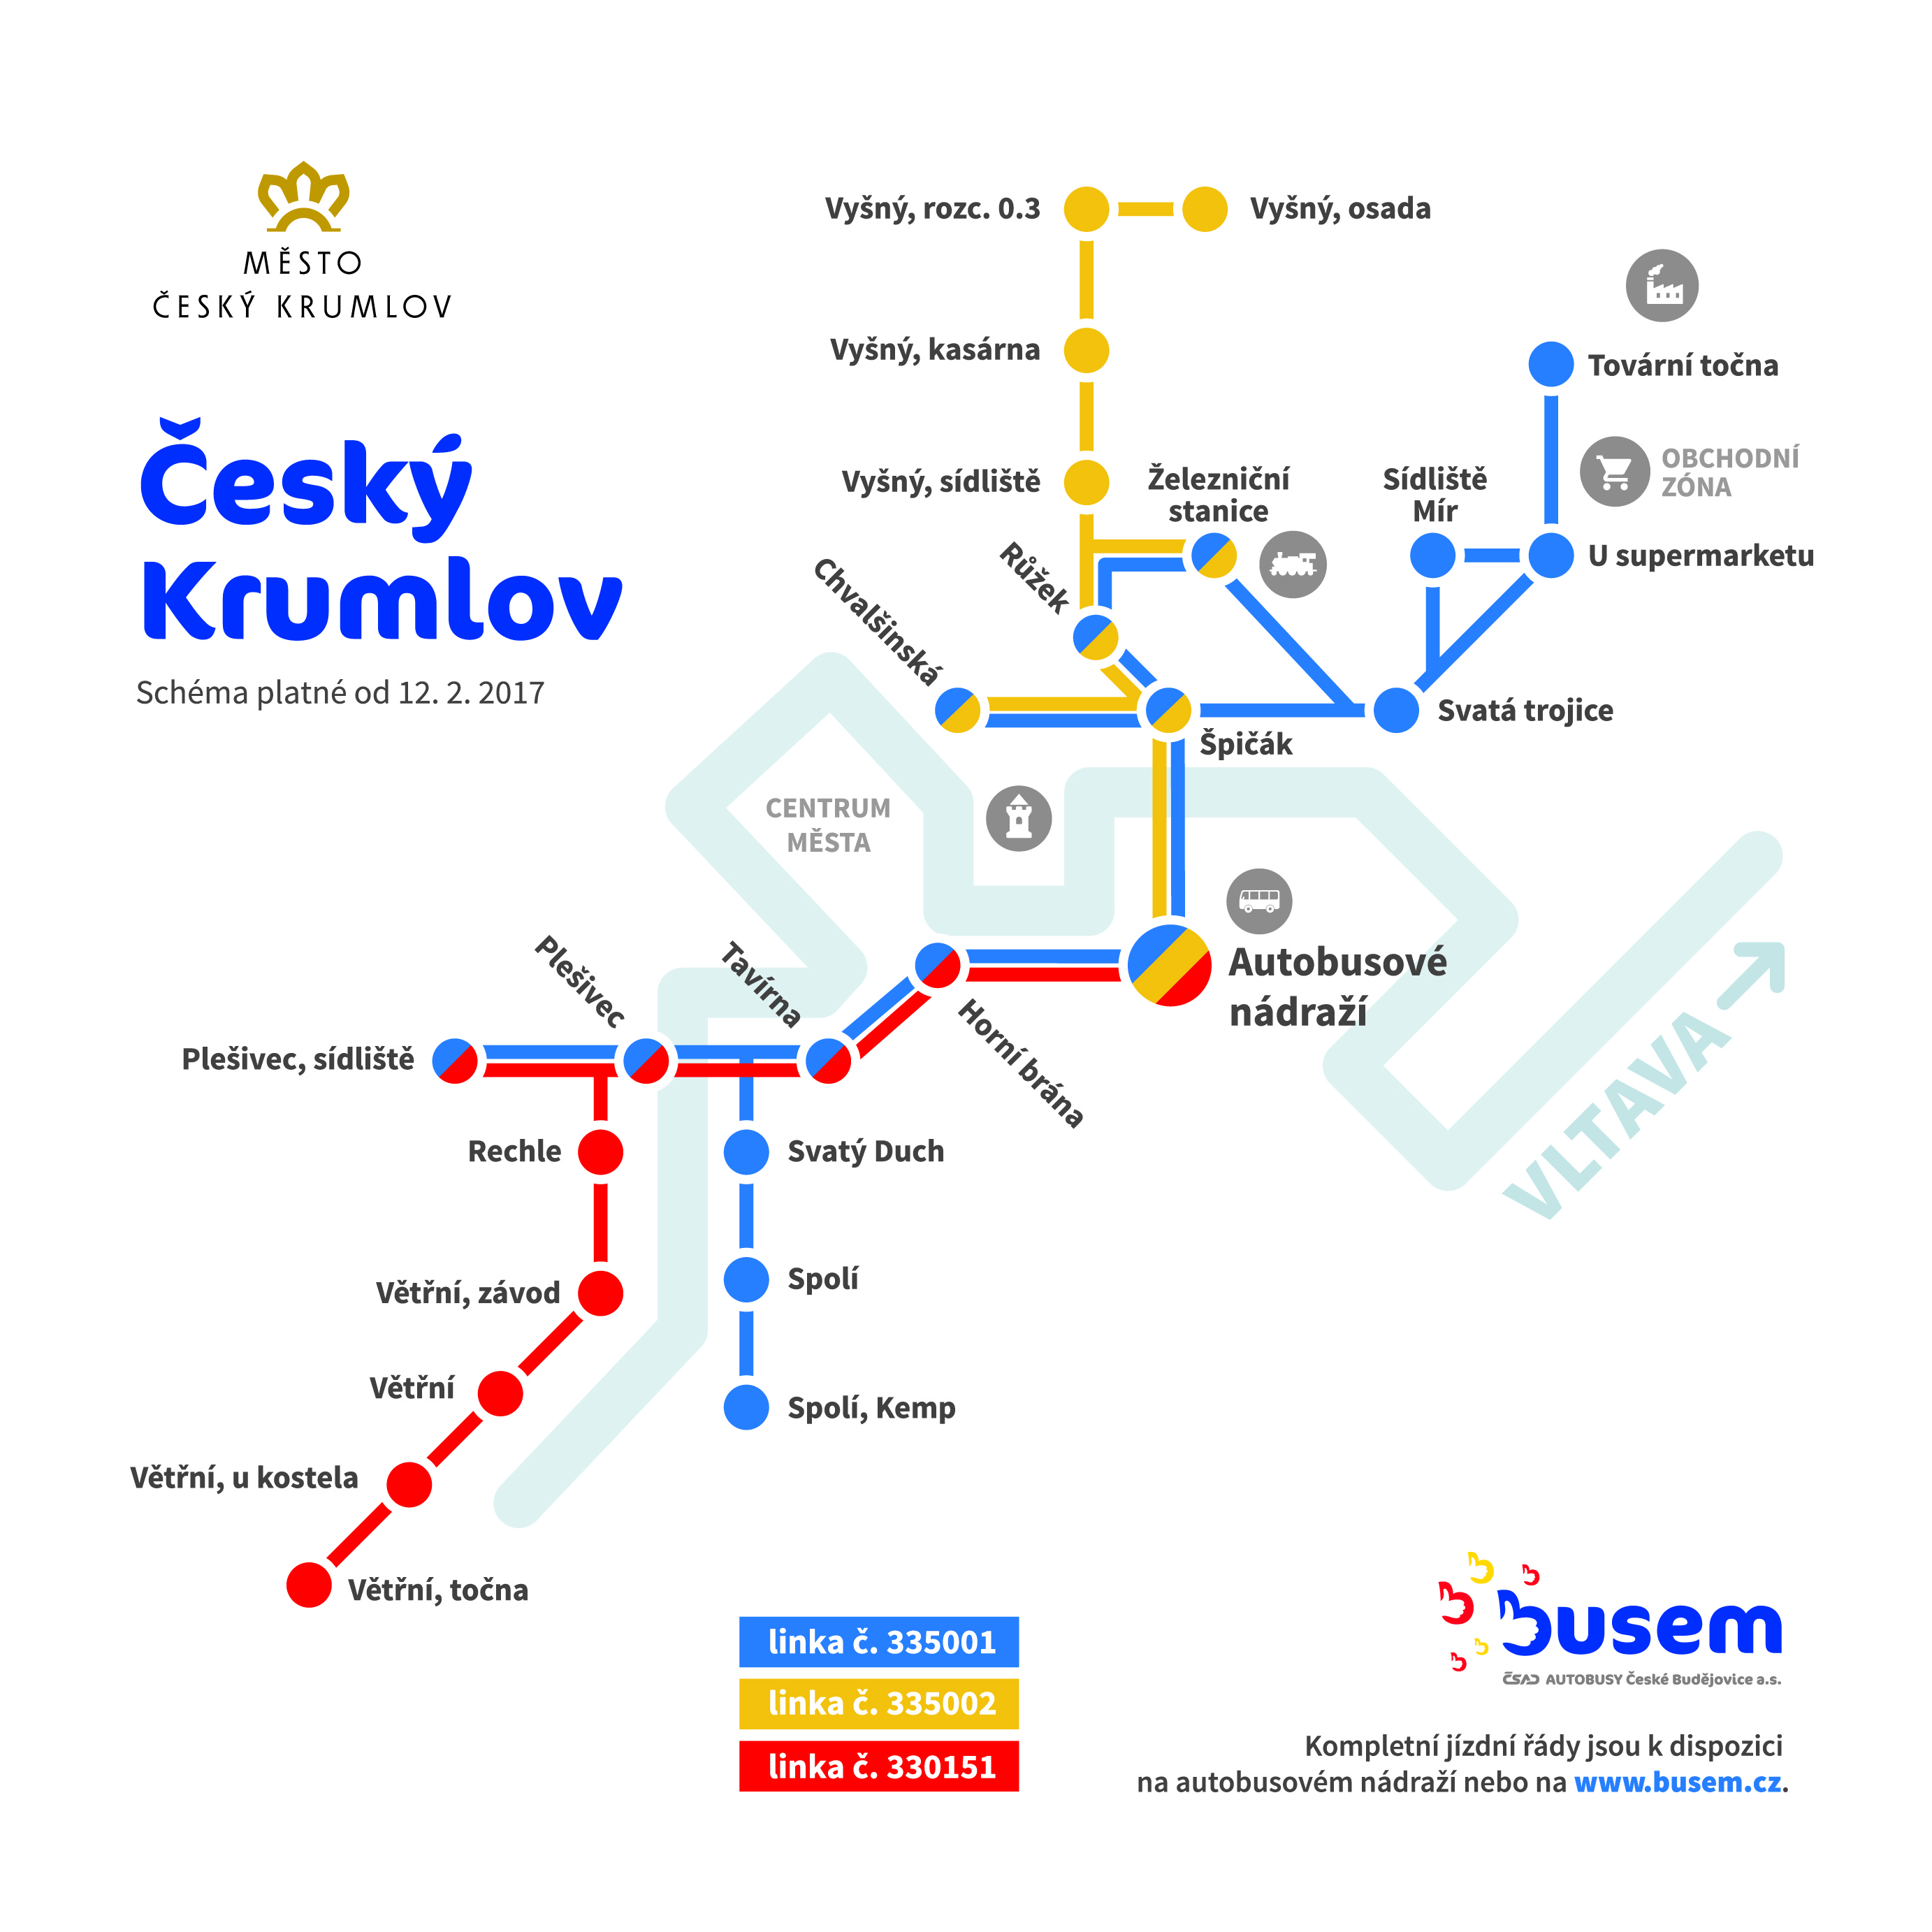 Mhd Cesky Krumlov Csad Autobusy Ceske Budejovice